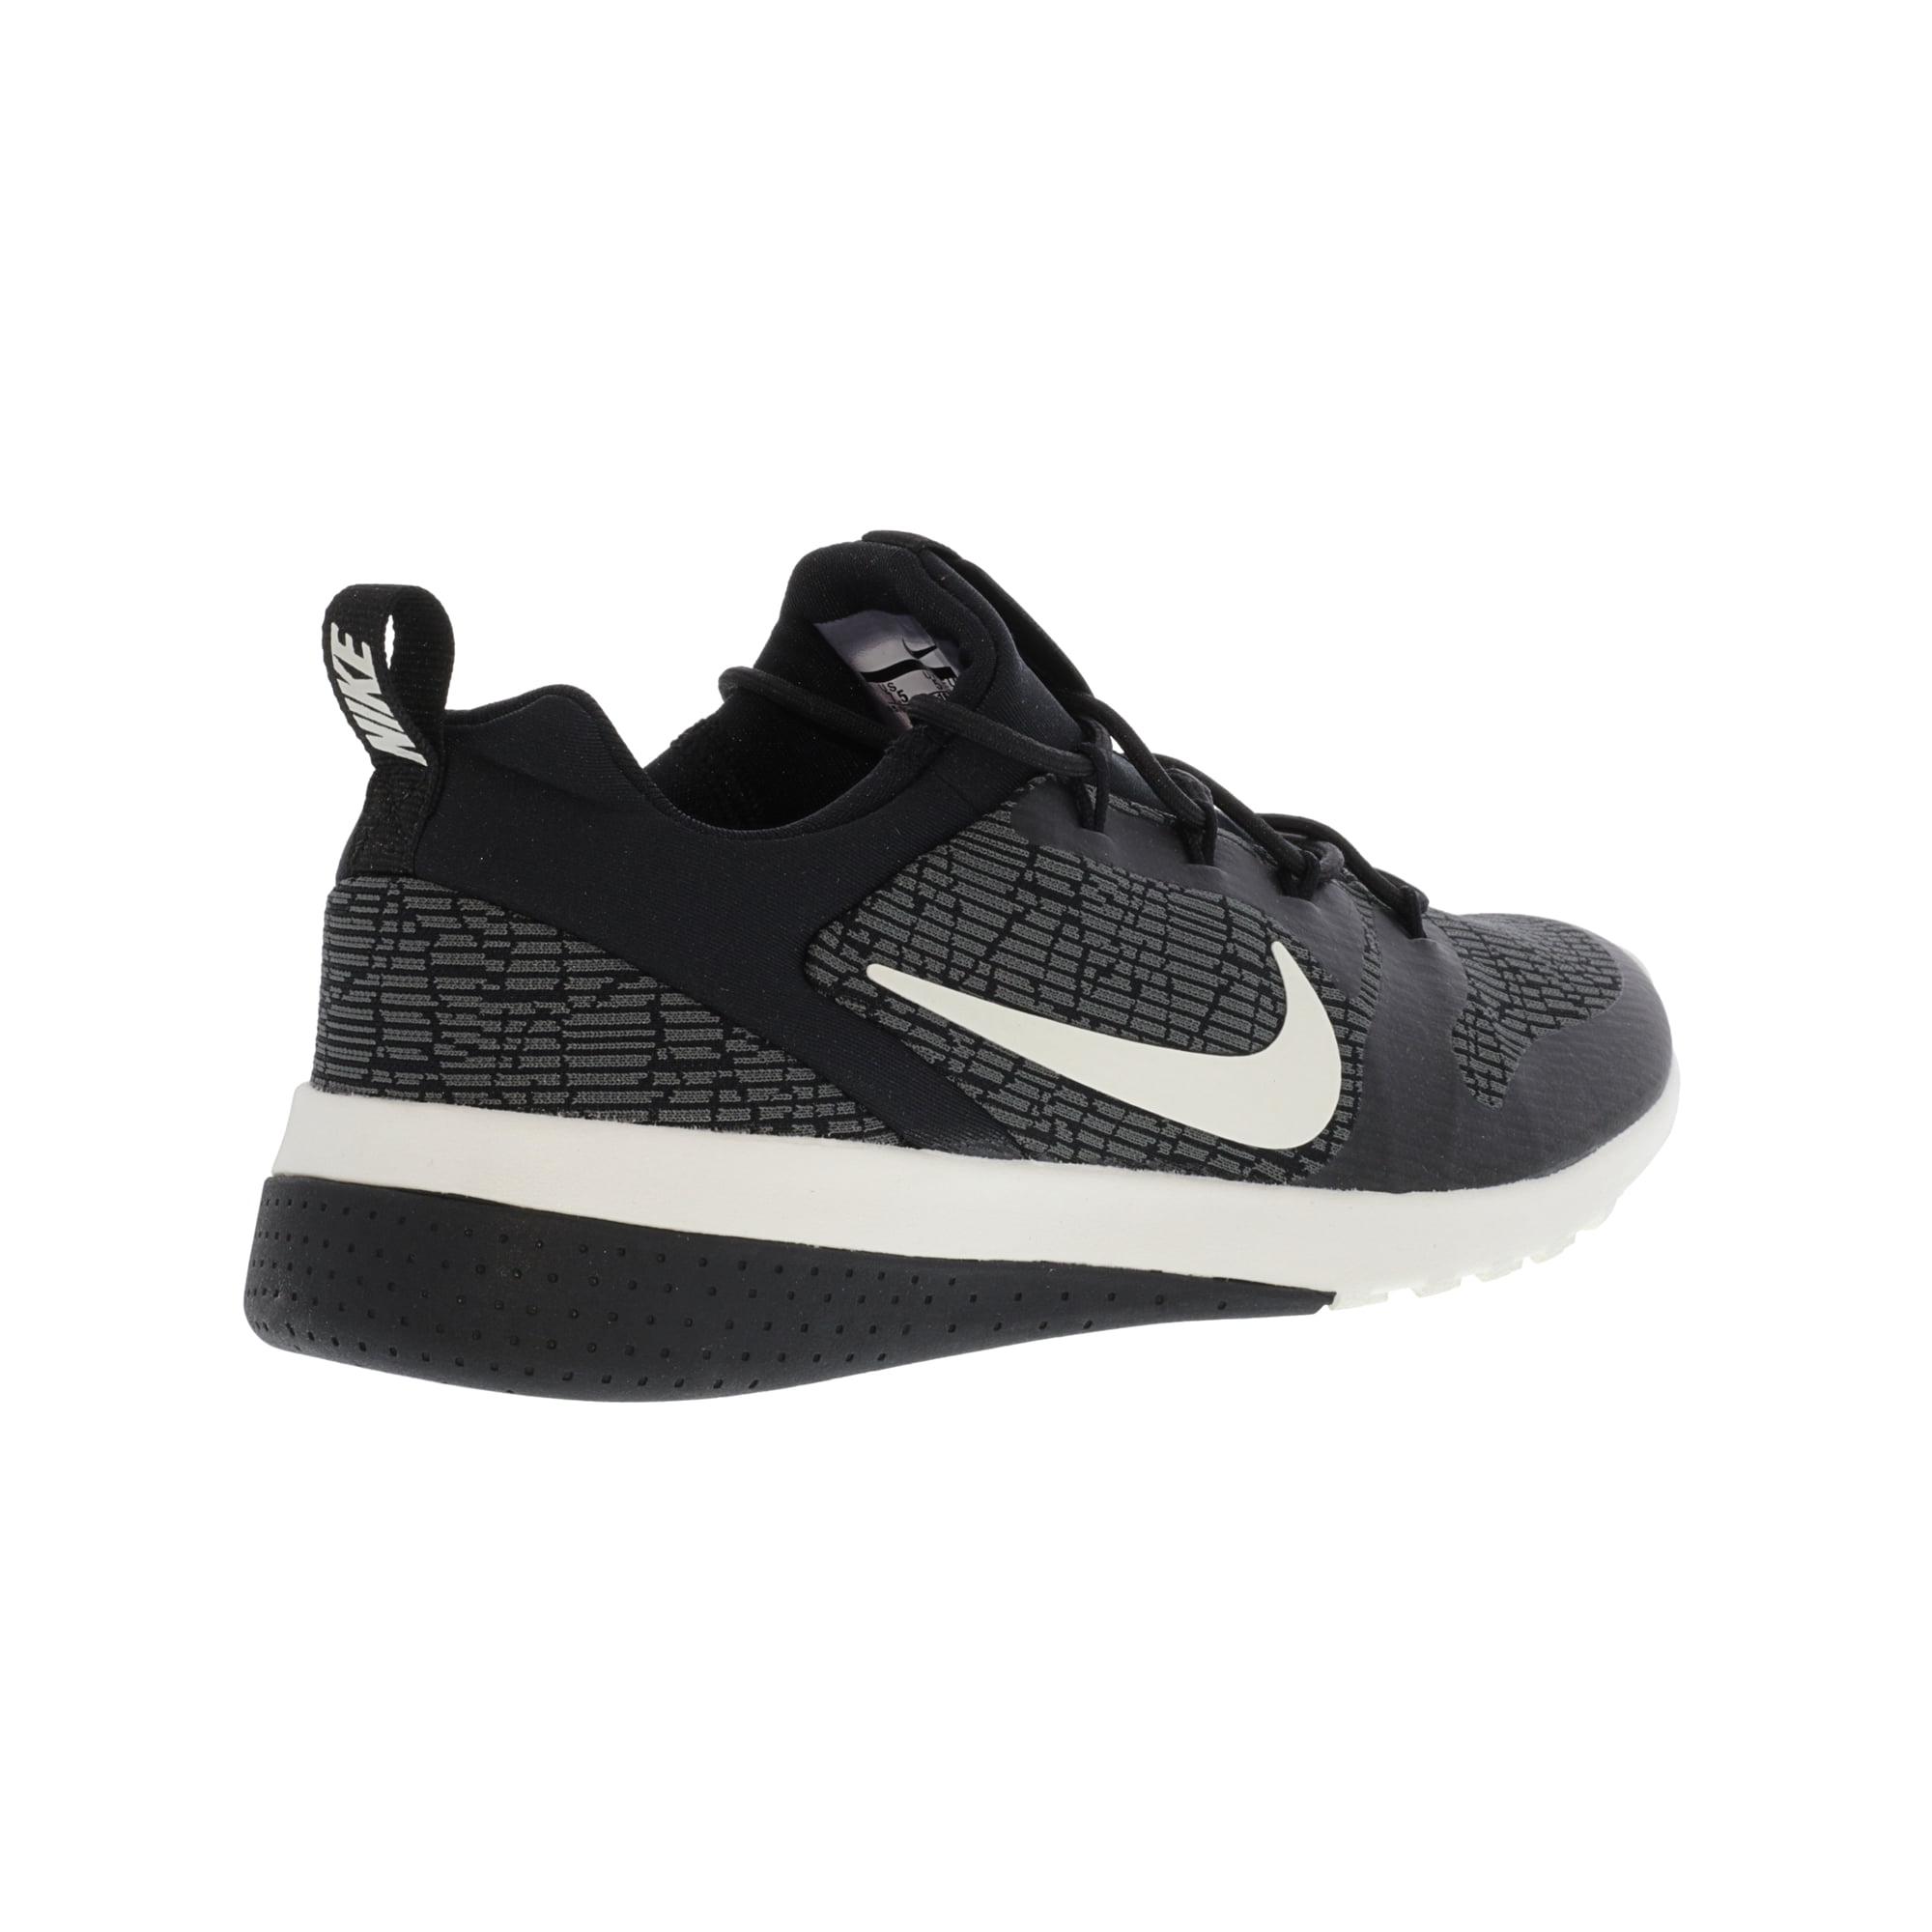 8b10aa1cc000 Nike Women s Ck Racer Cargo Khaki   Ankle-High Running Shoe - 9.5M ...